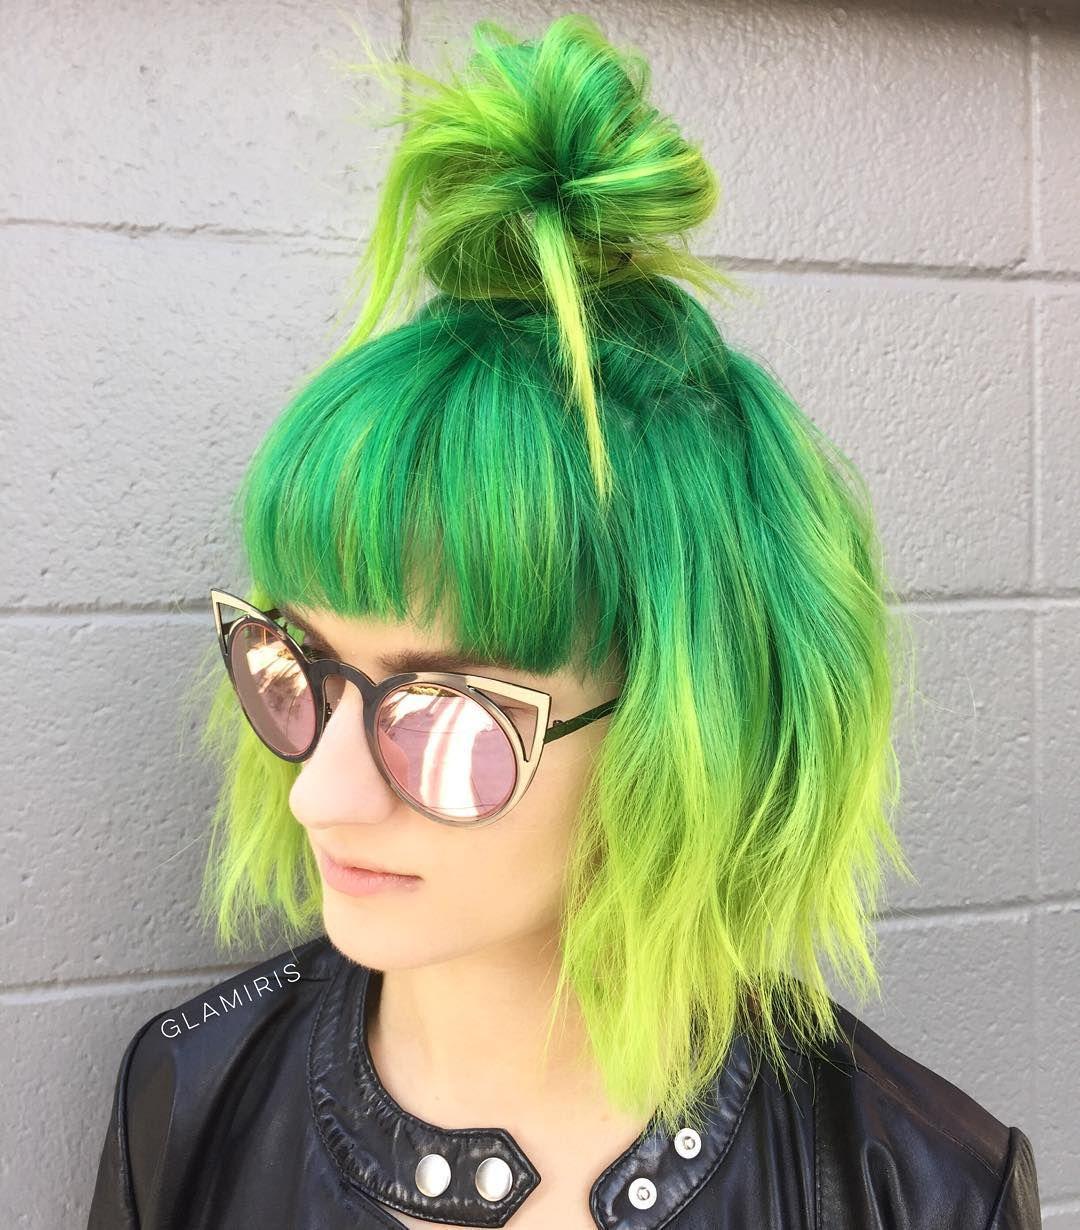 Credits glamiris on instagram hair pinterest color melting